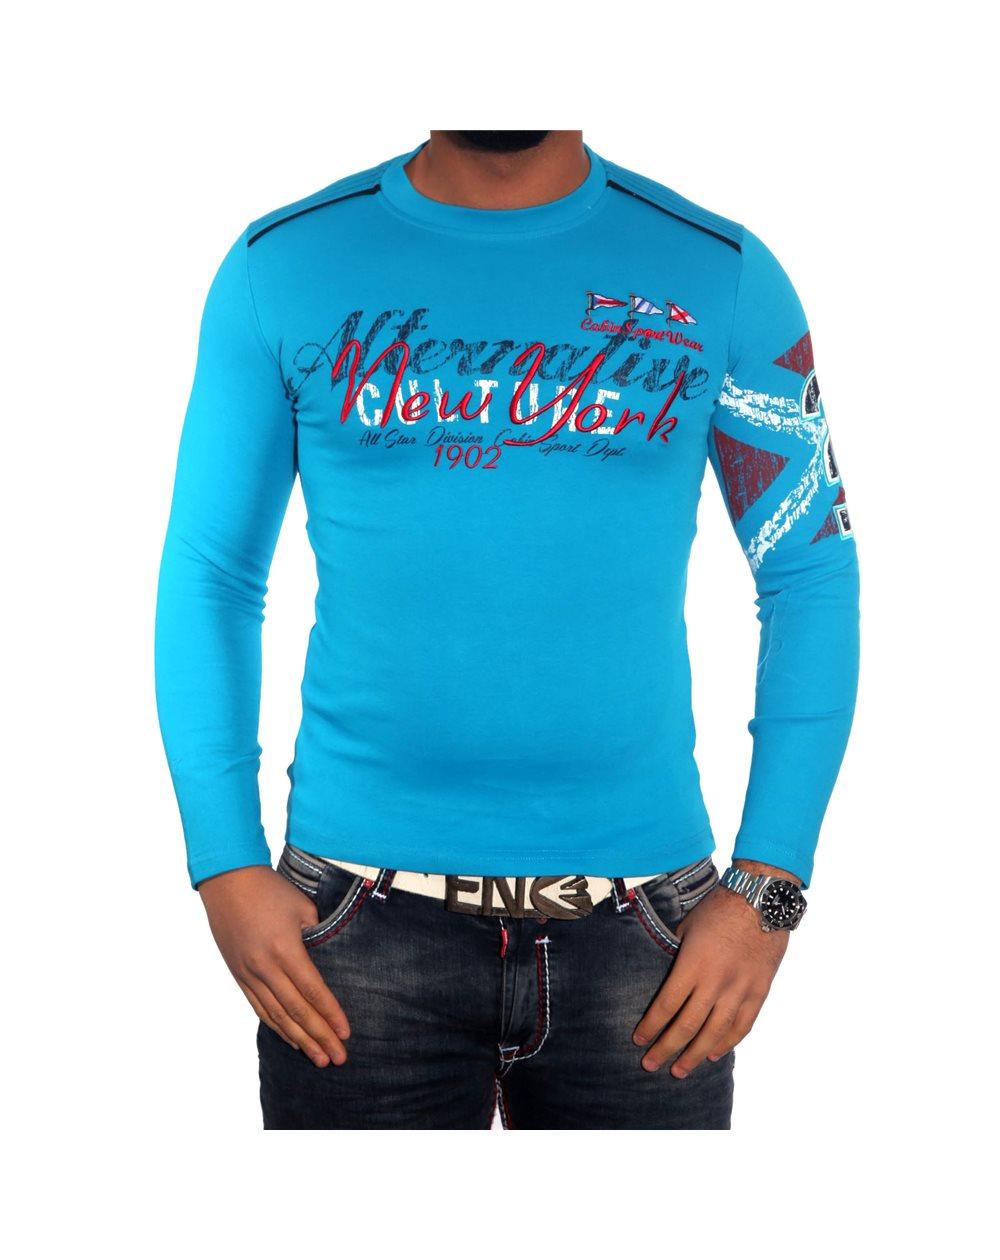 Subliminal Mode - Tee shirt homme manches longues col arrondi pull leger SBC150